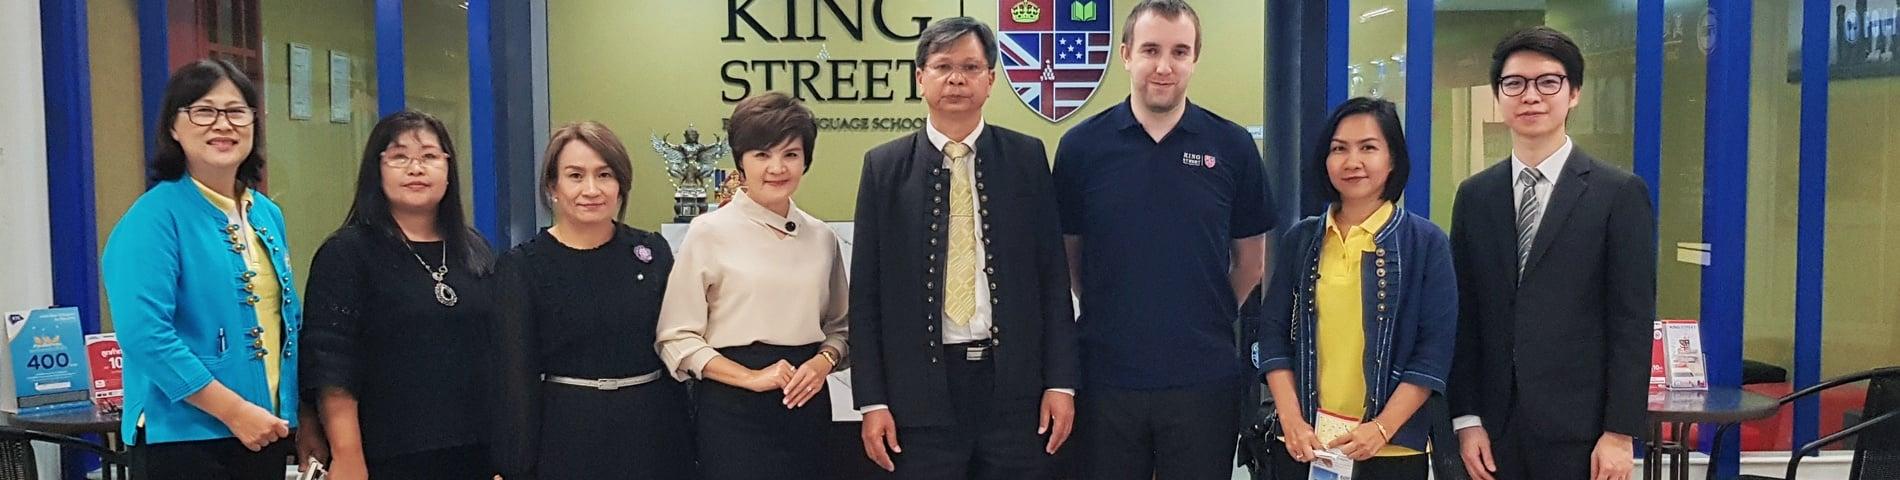 King Street English Language School صورة 1